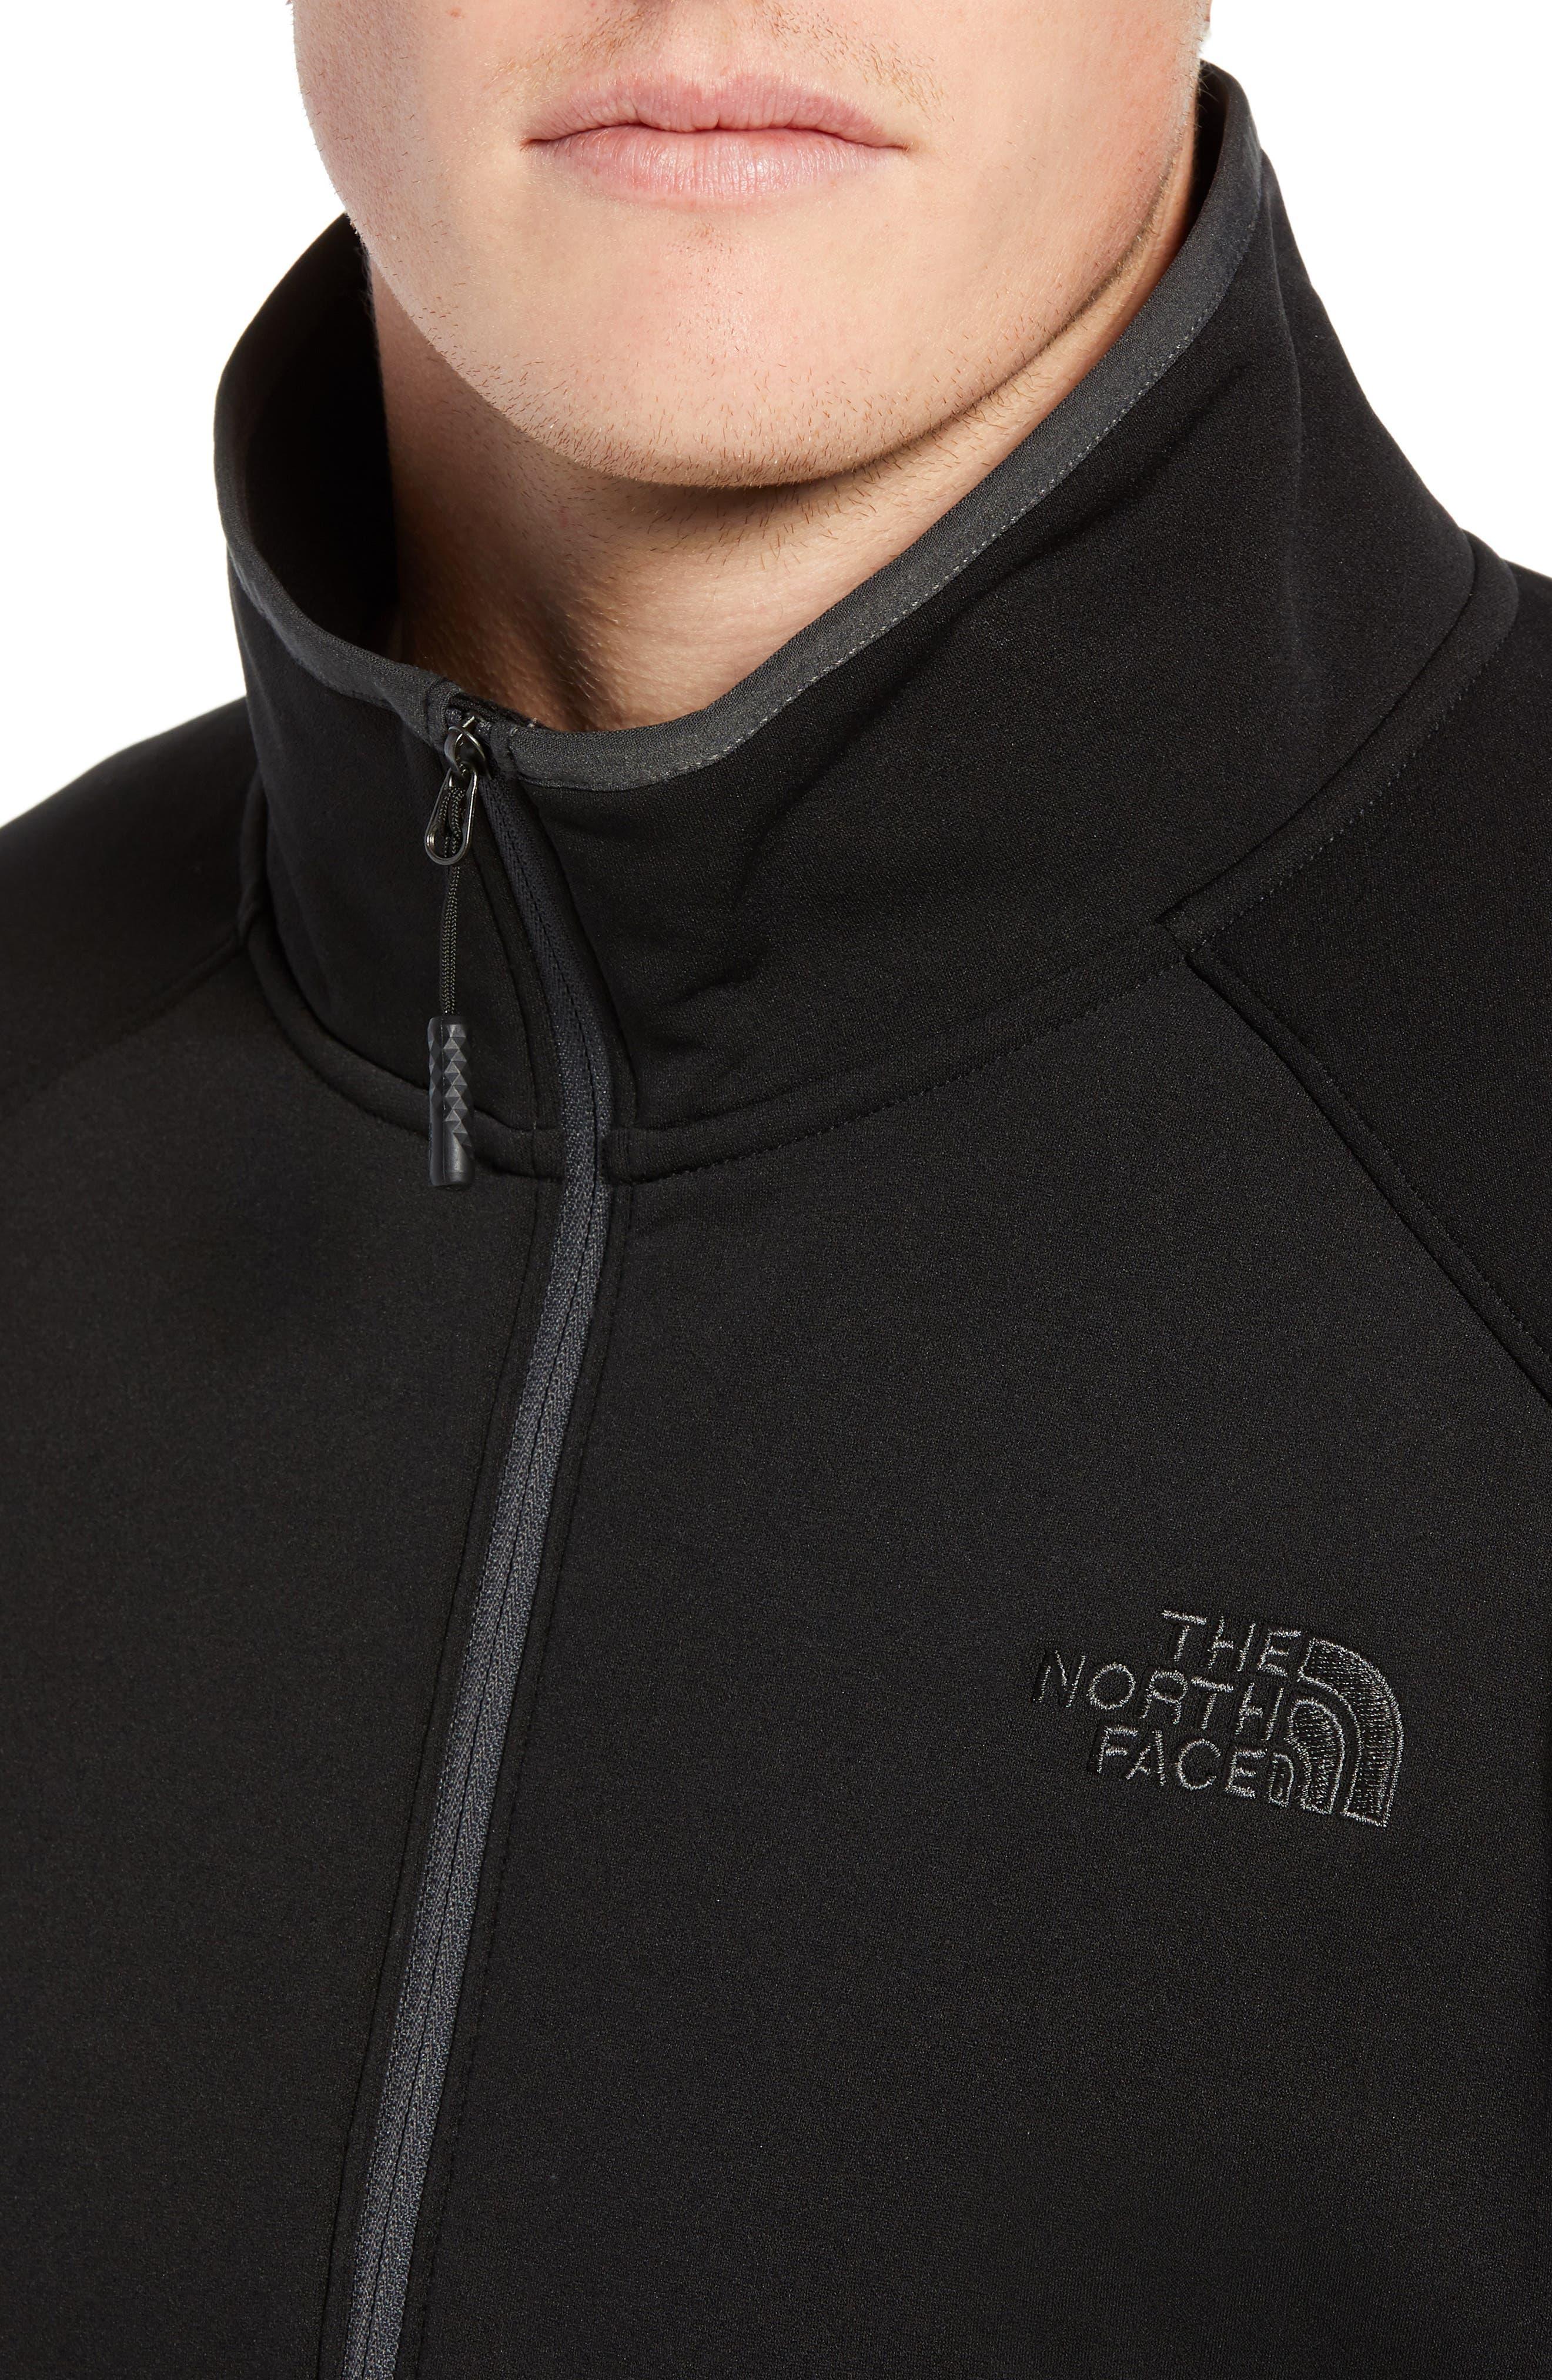 THE NORTH FACE, Tolmiepeak Hybrid Half-Zip Pullover, Alternate thumbnail 5, color, 001